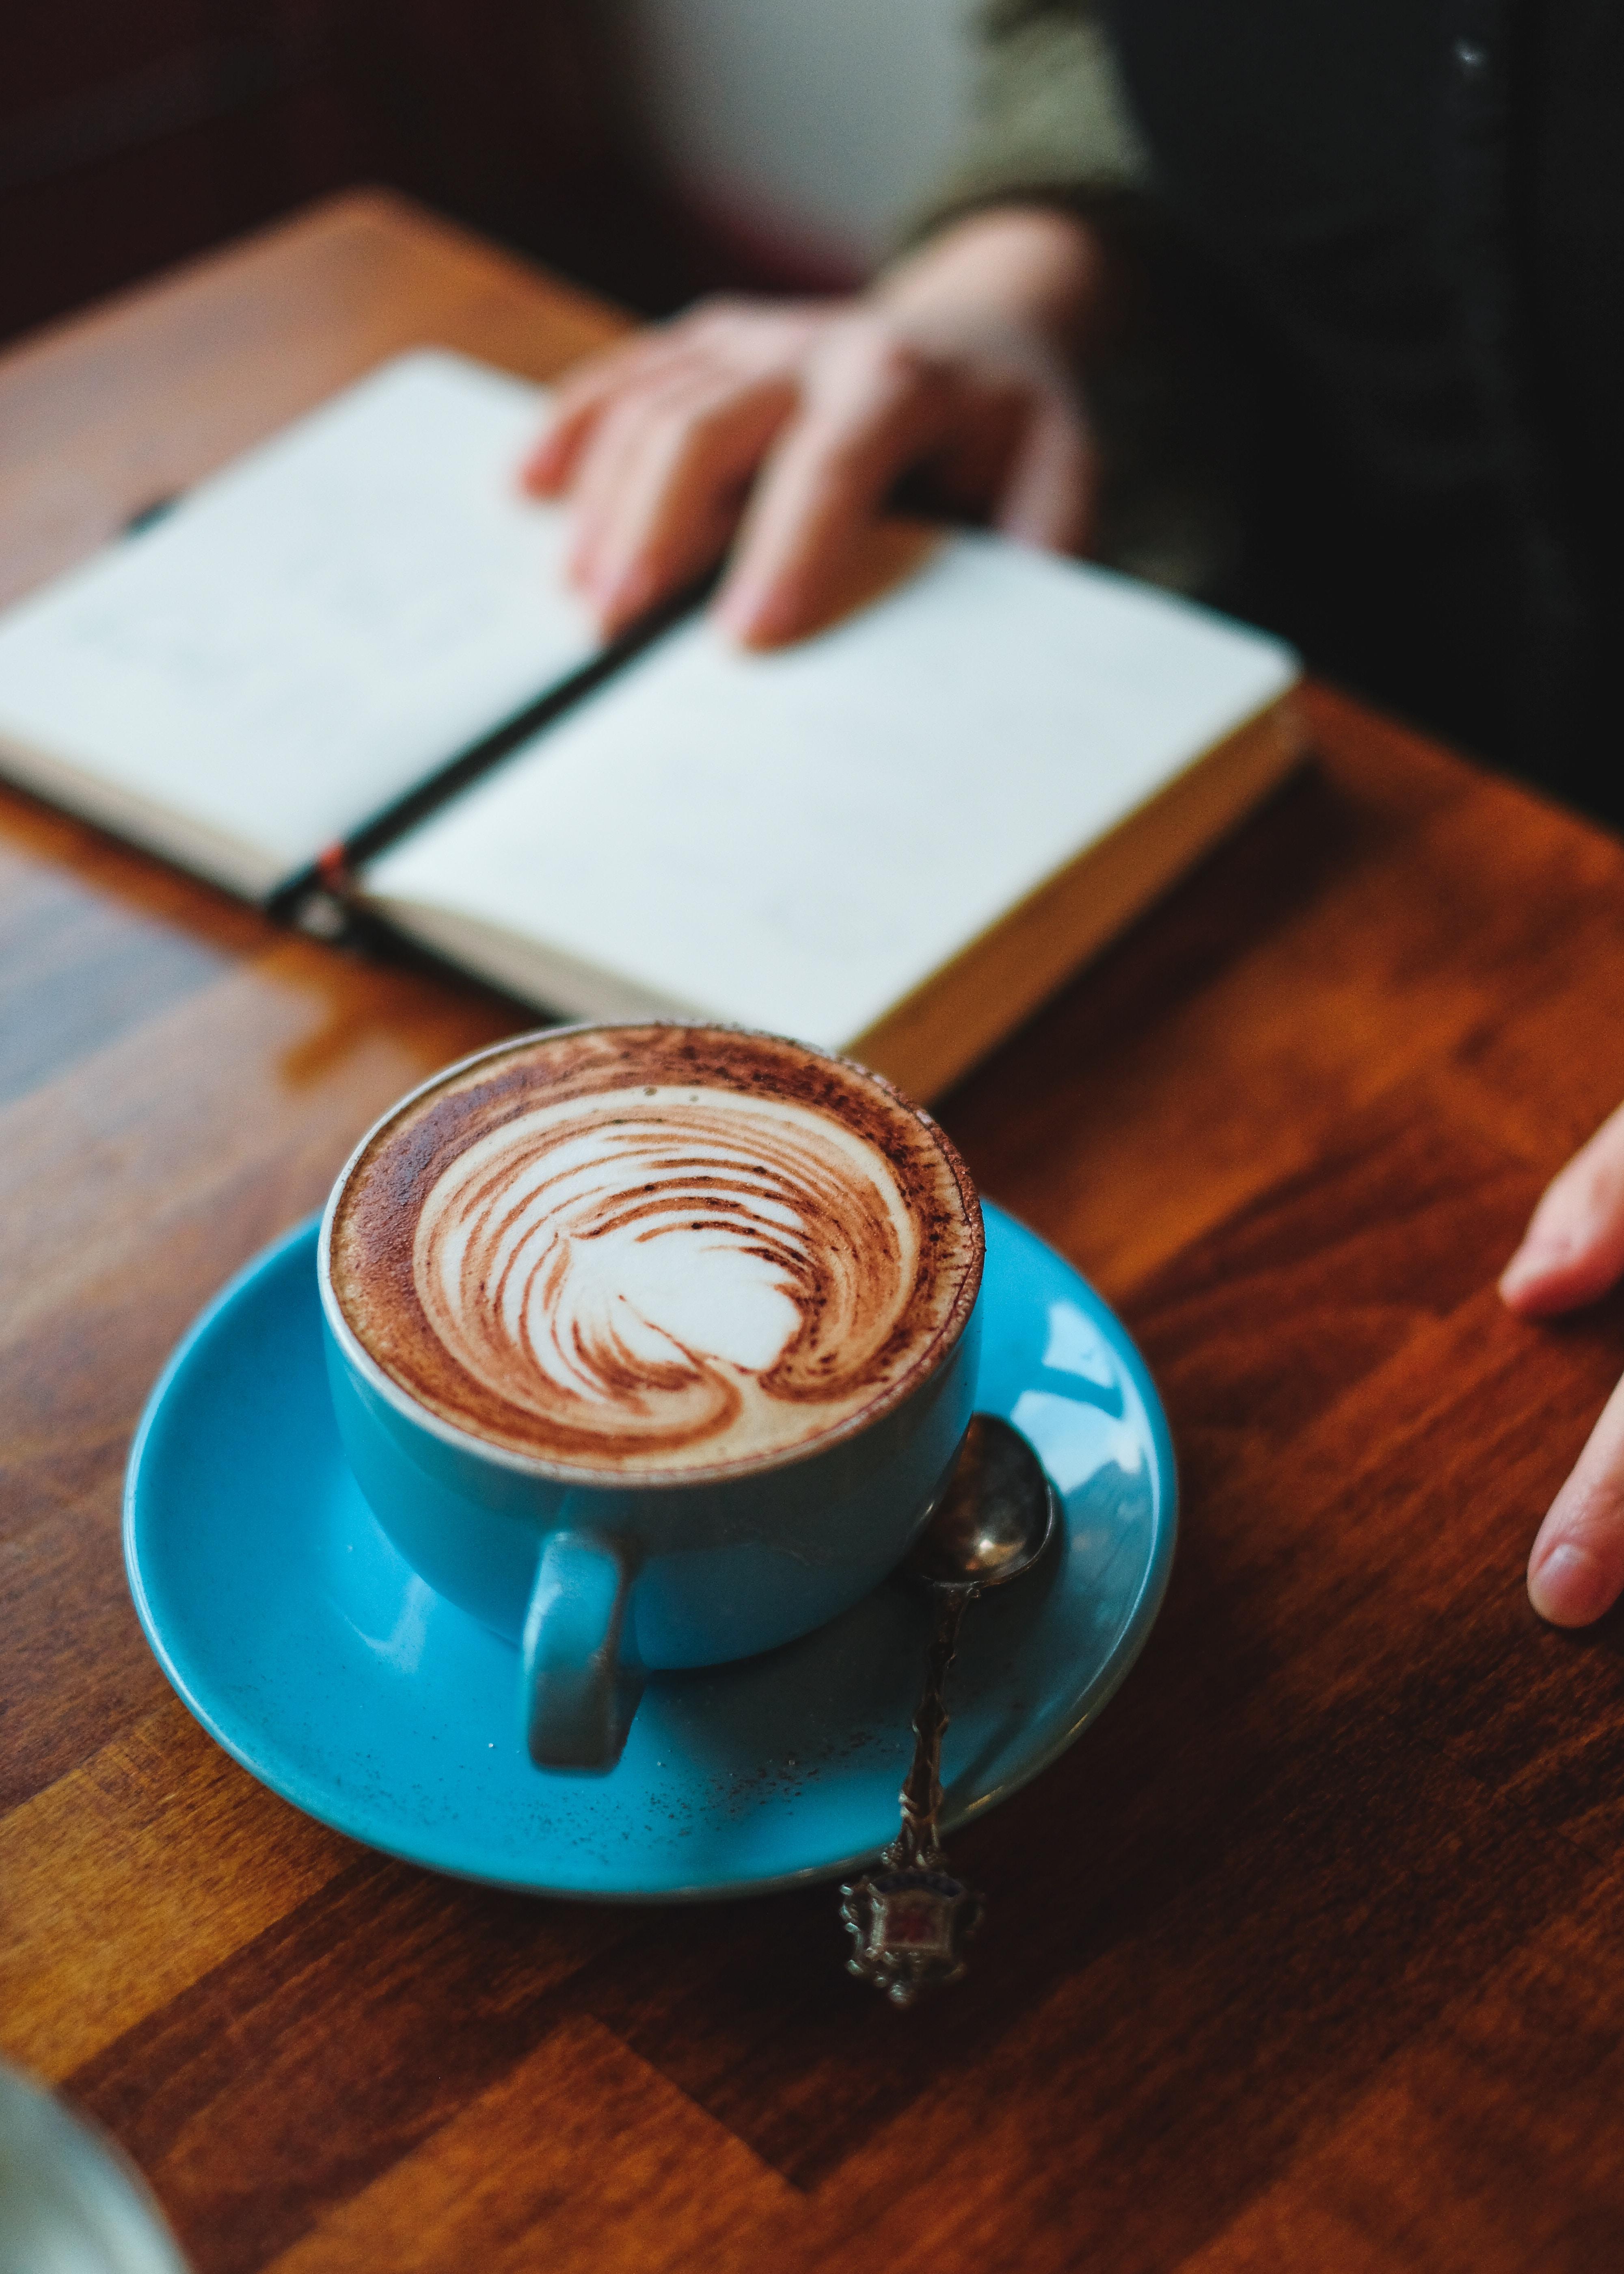 coffee in blue ceramic mug on blue ceramic plate on table